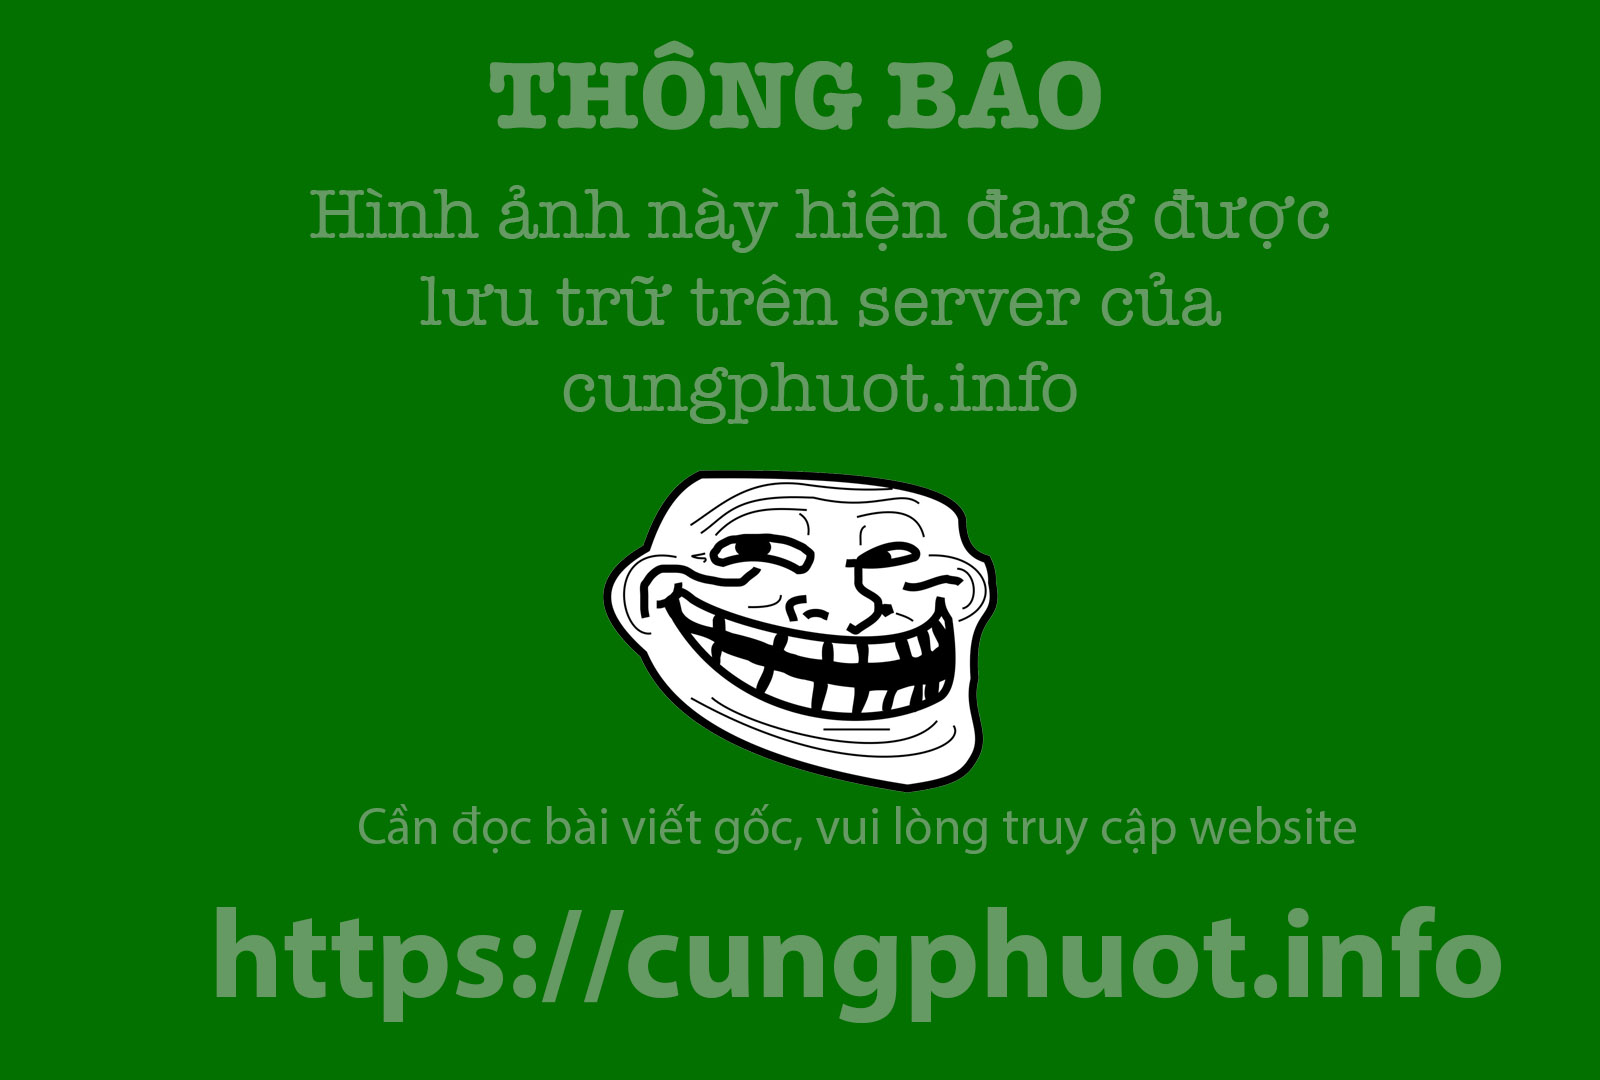 bai-dong-diem-den-moi-noi-dang-hot-o-mien-bac-he-nay-ivivu-13